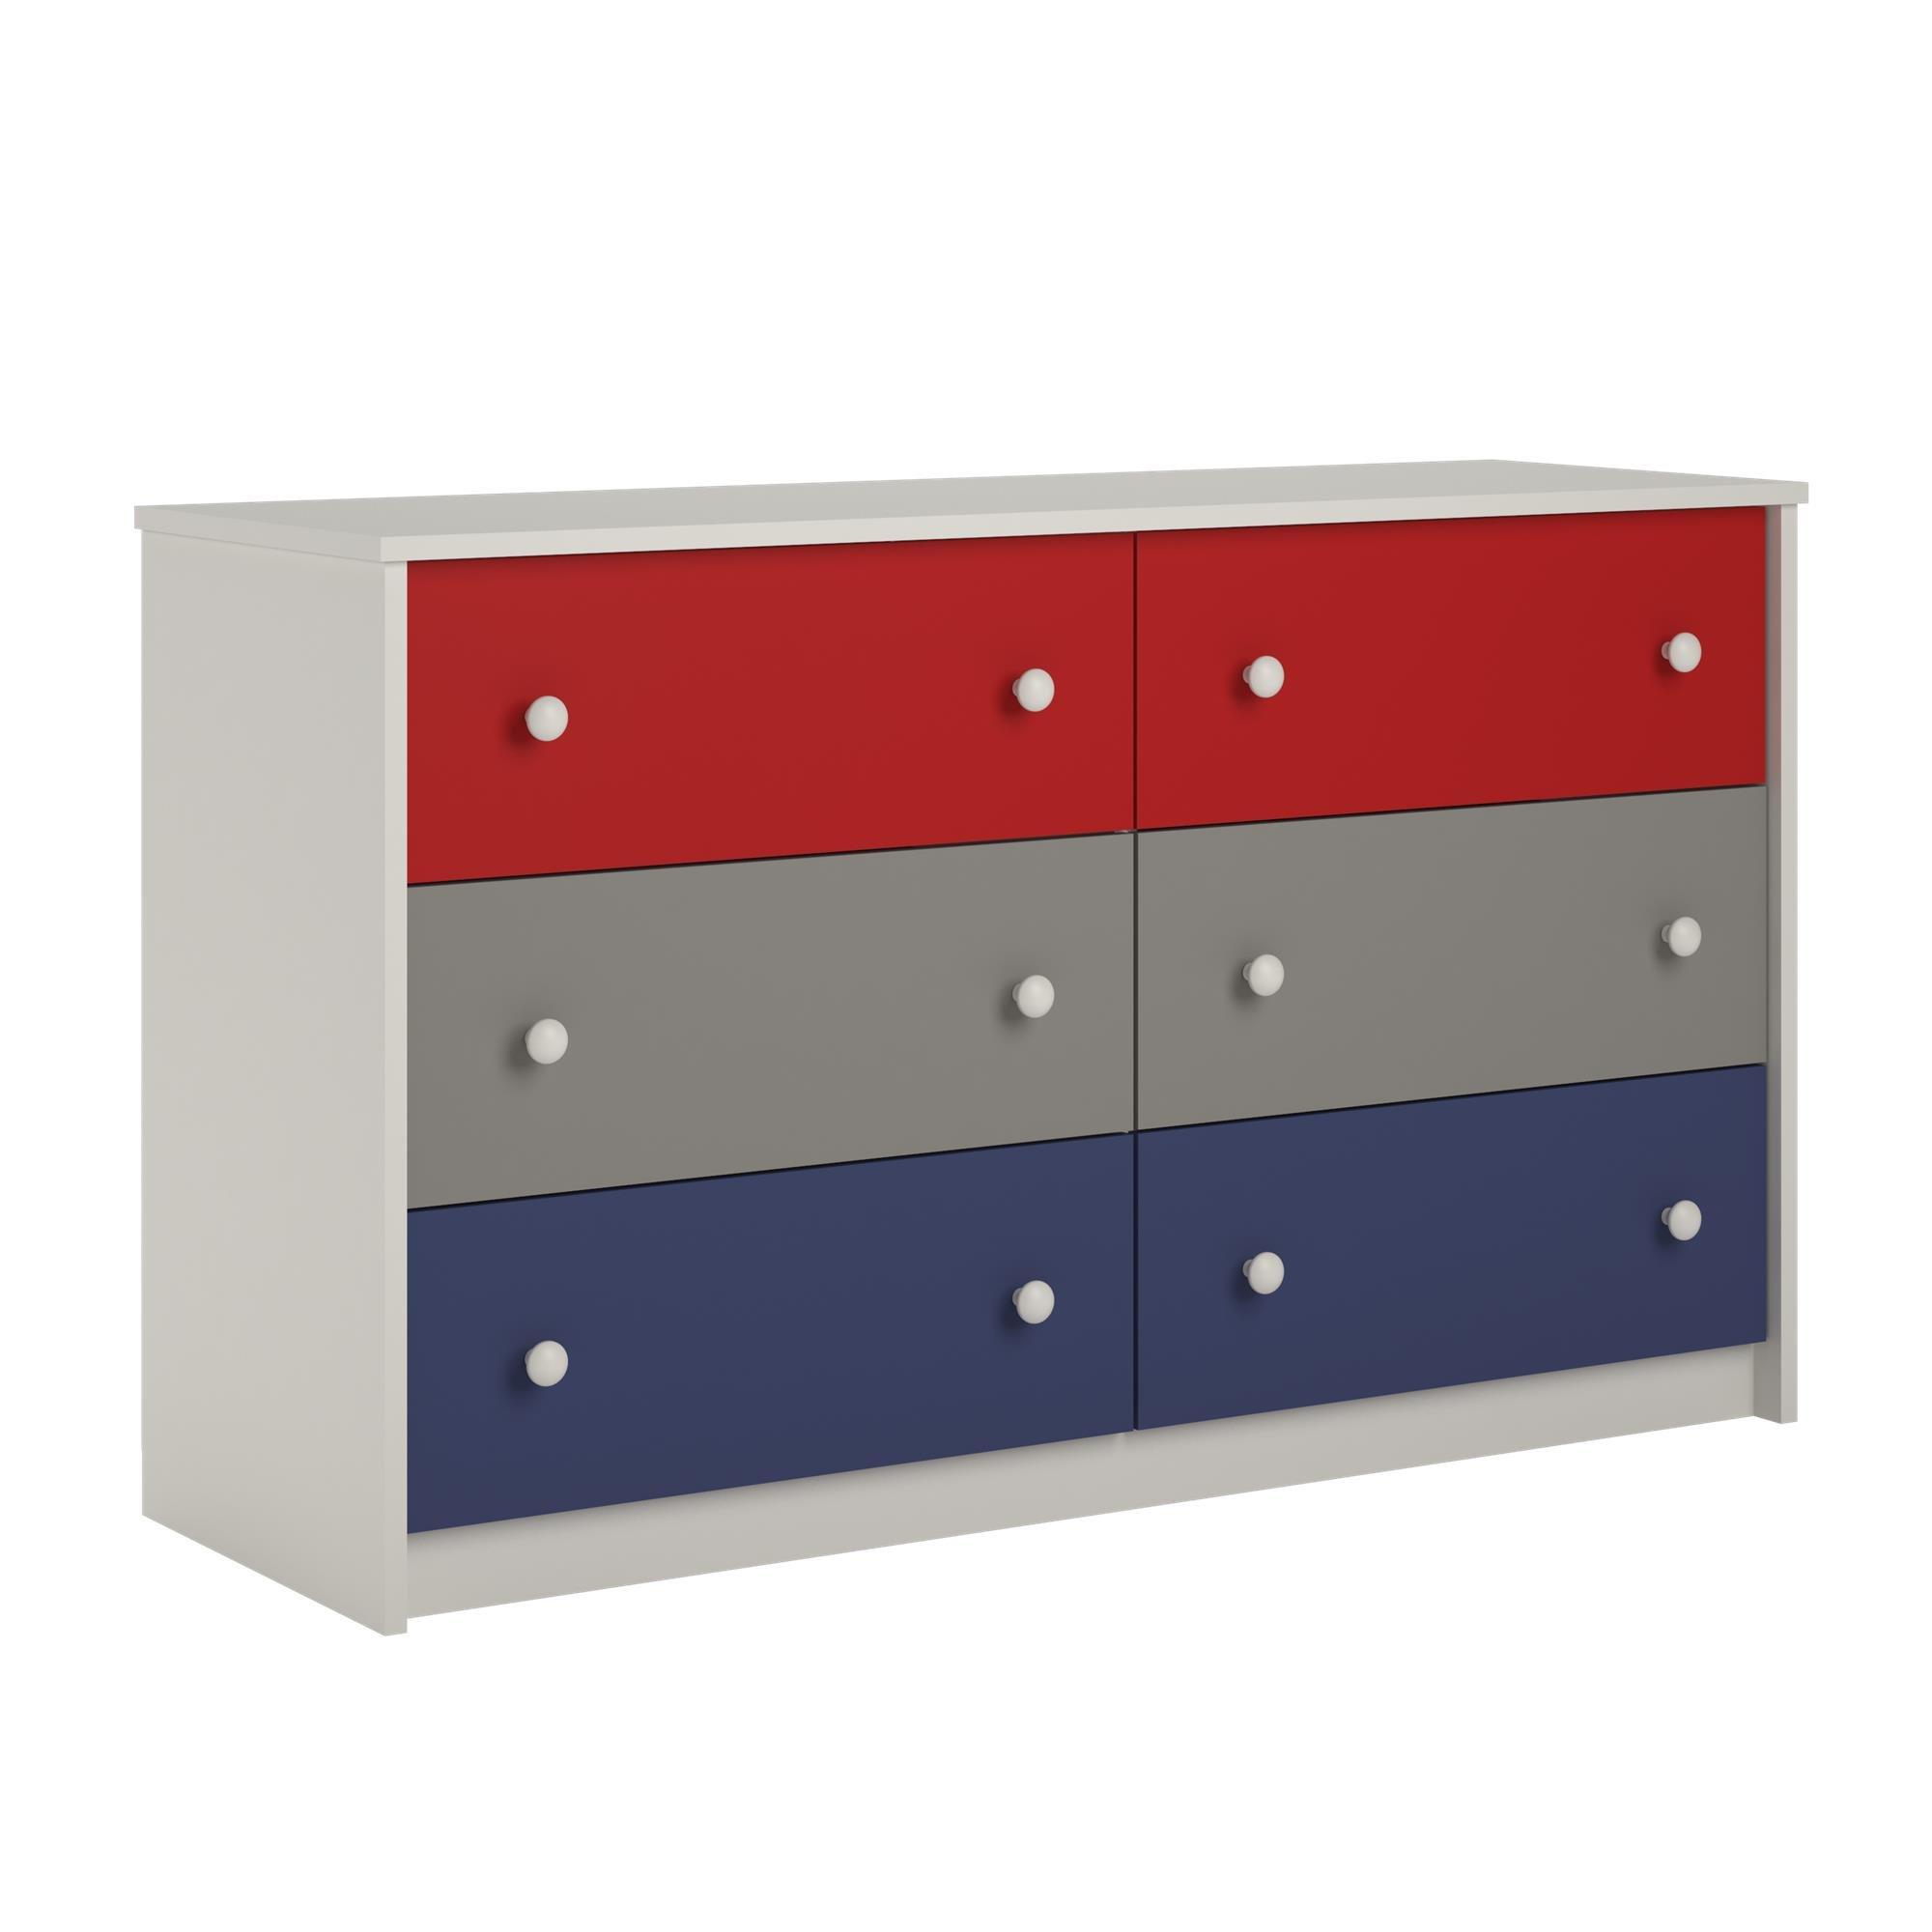 Cosco Kids Furniture Kaleidoscope 6 Drawer Dresser, Classic/White Stipple